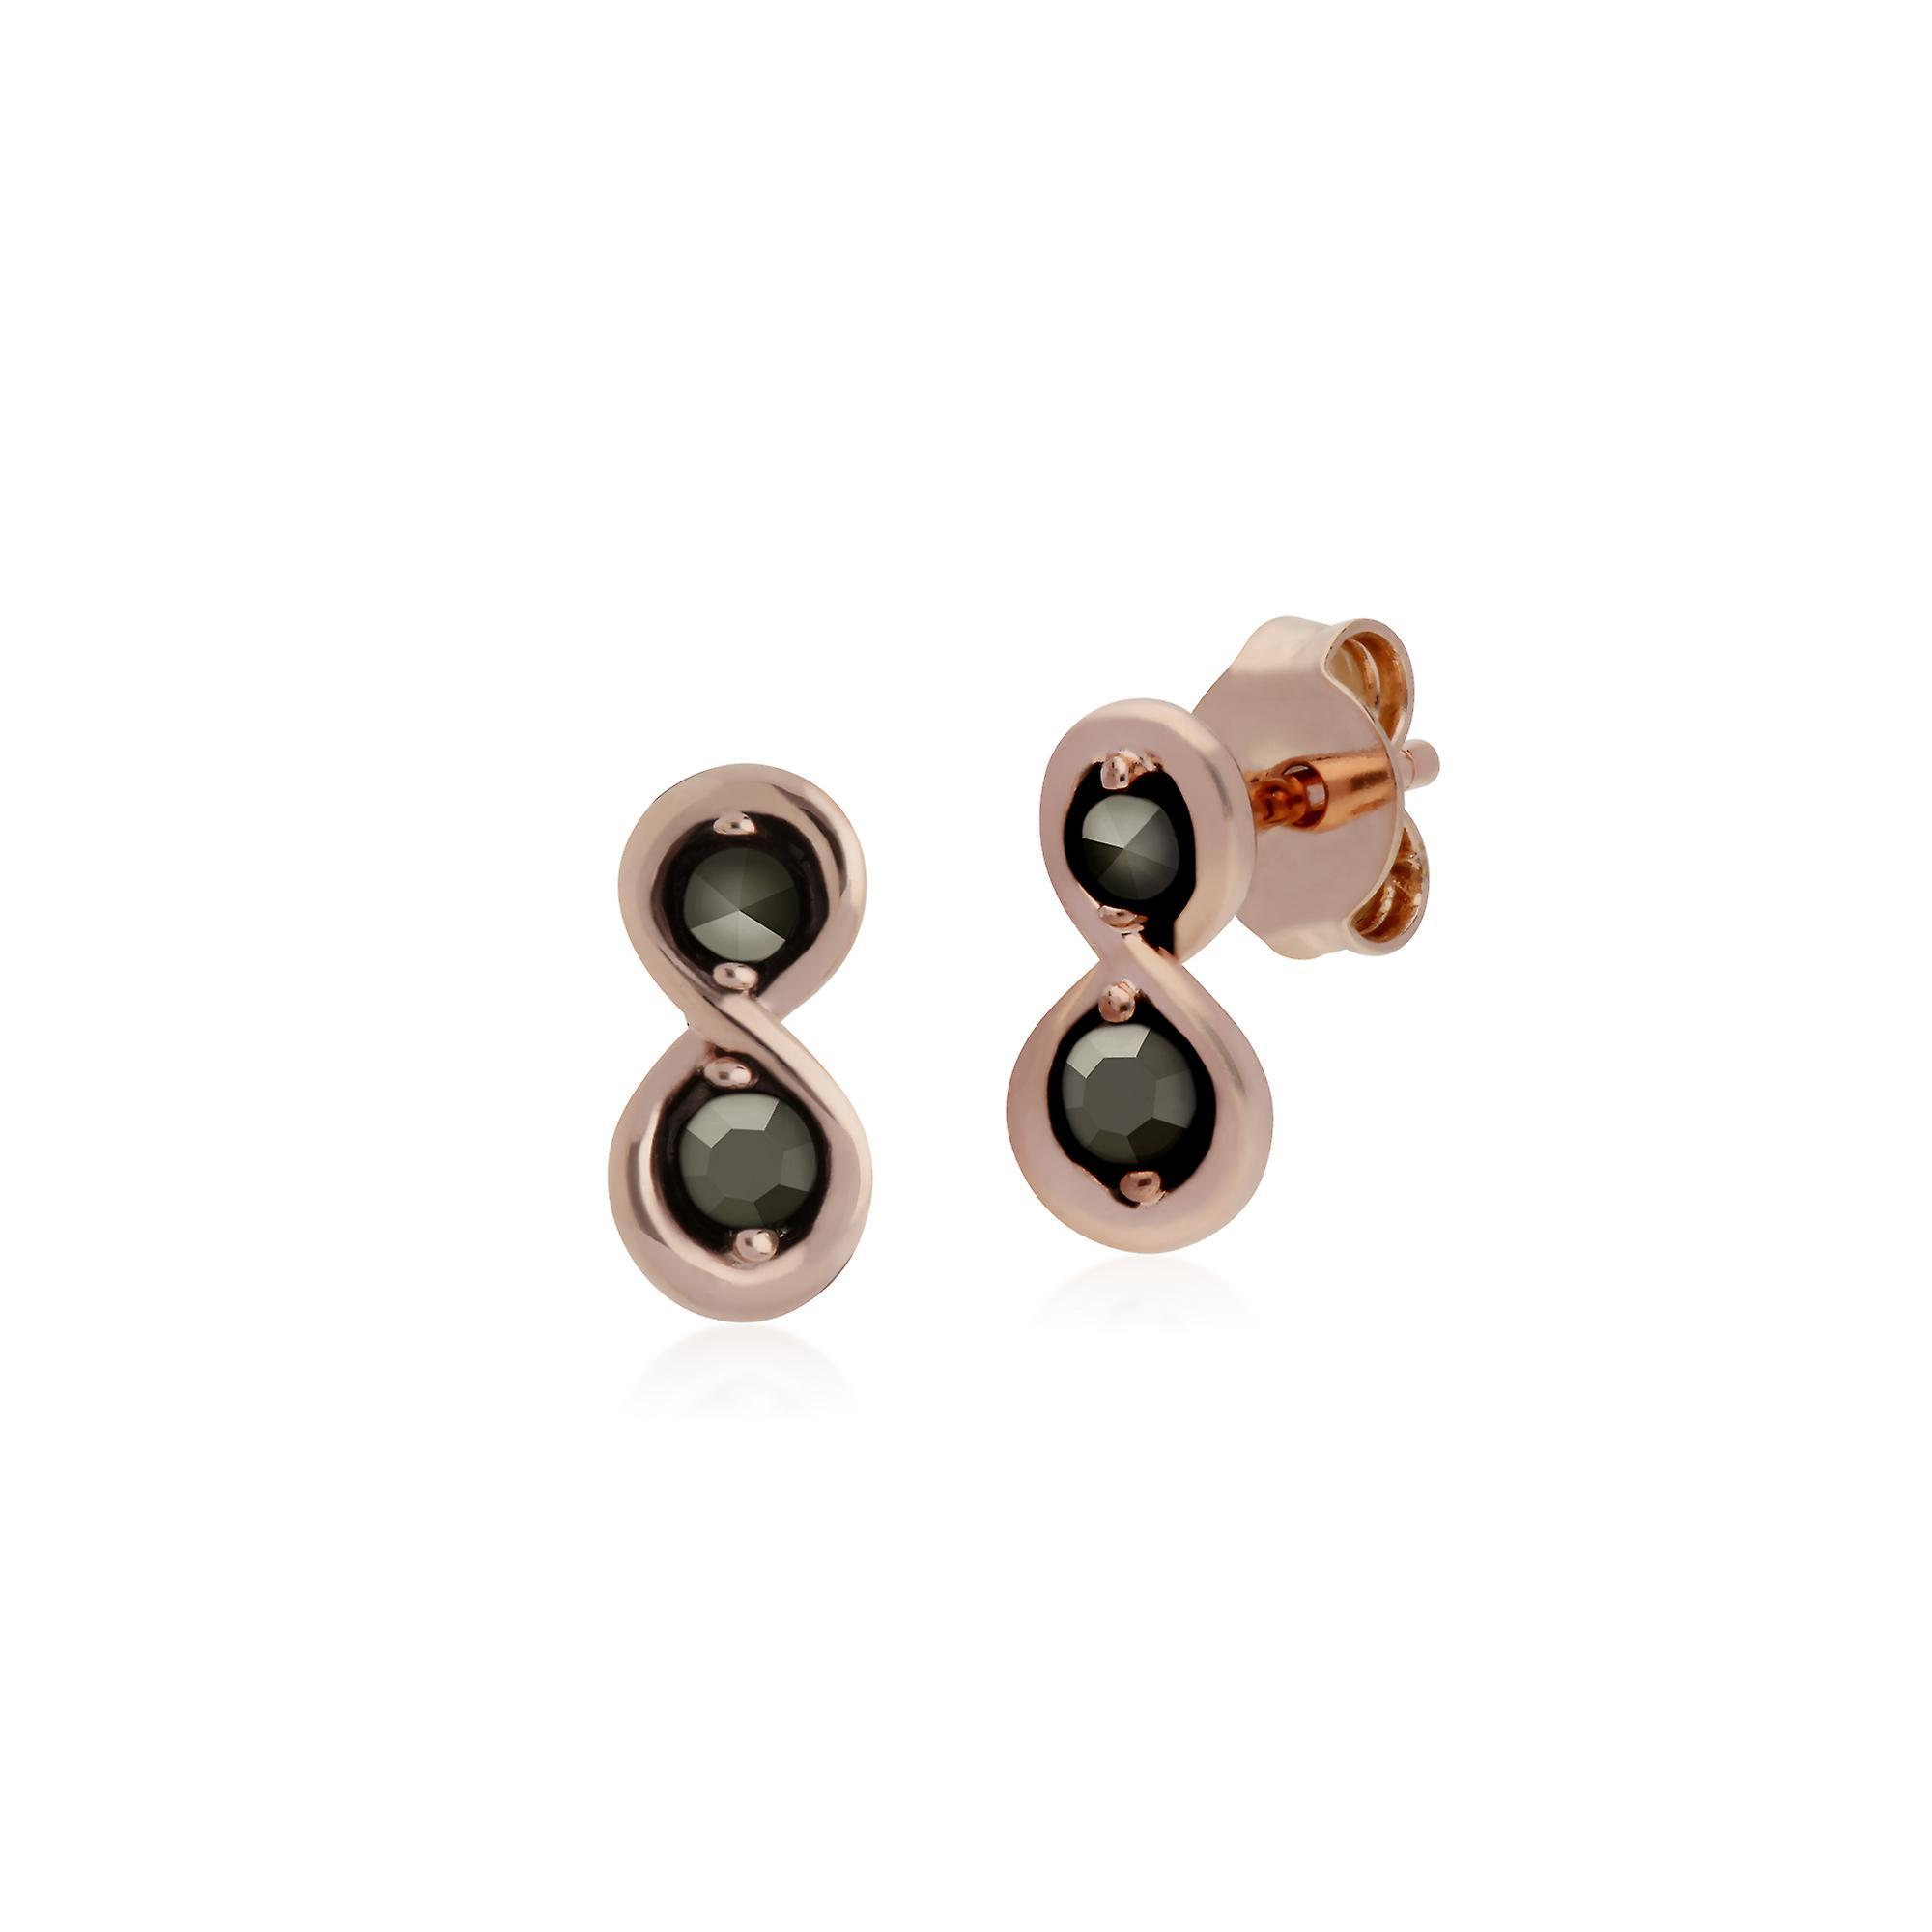 Gemondo Rose Gold Plated Sterling Silver Infinity Marcasite Stud Earrings